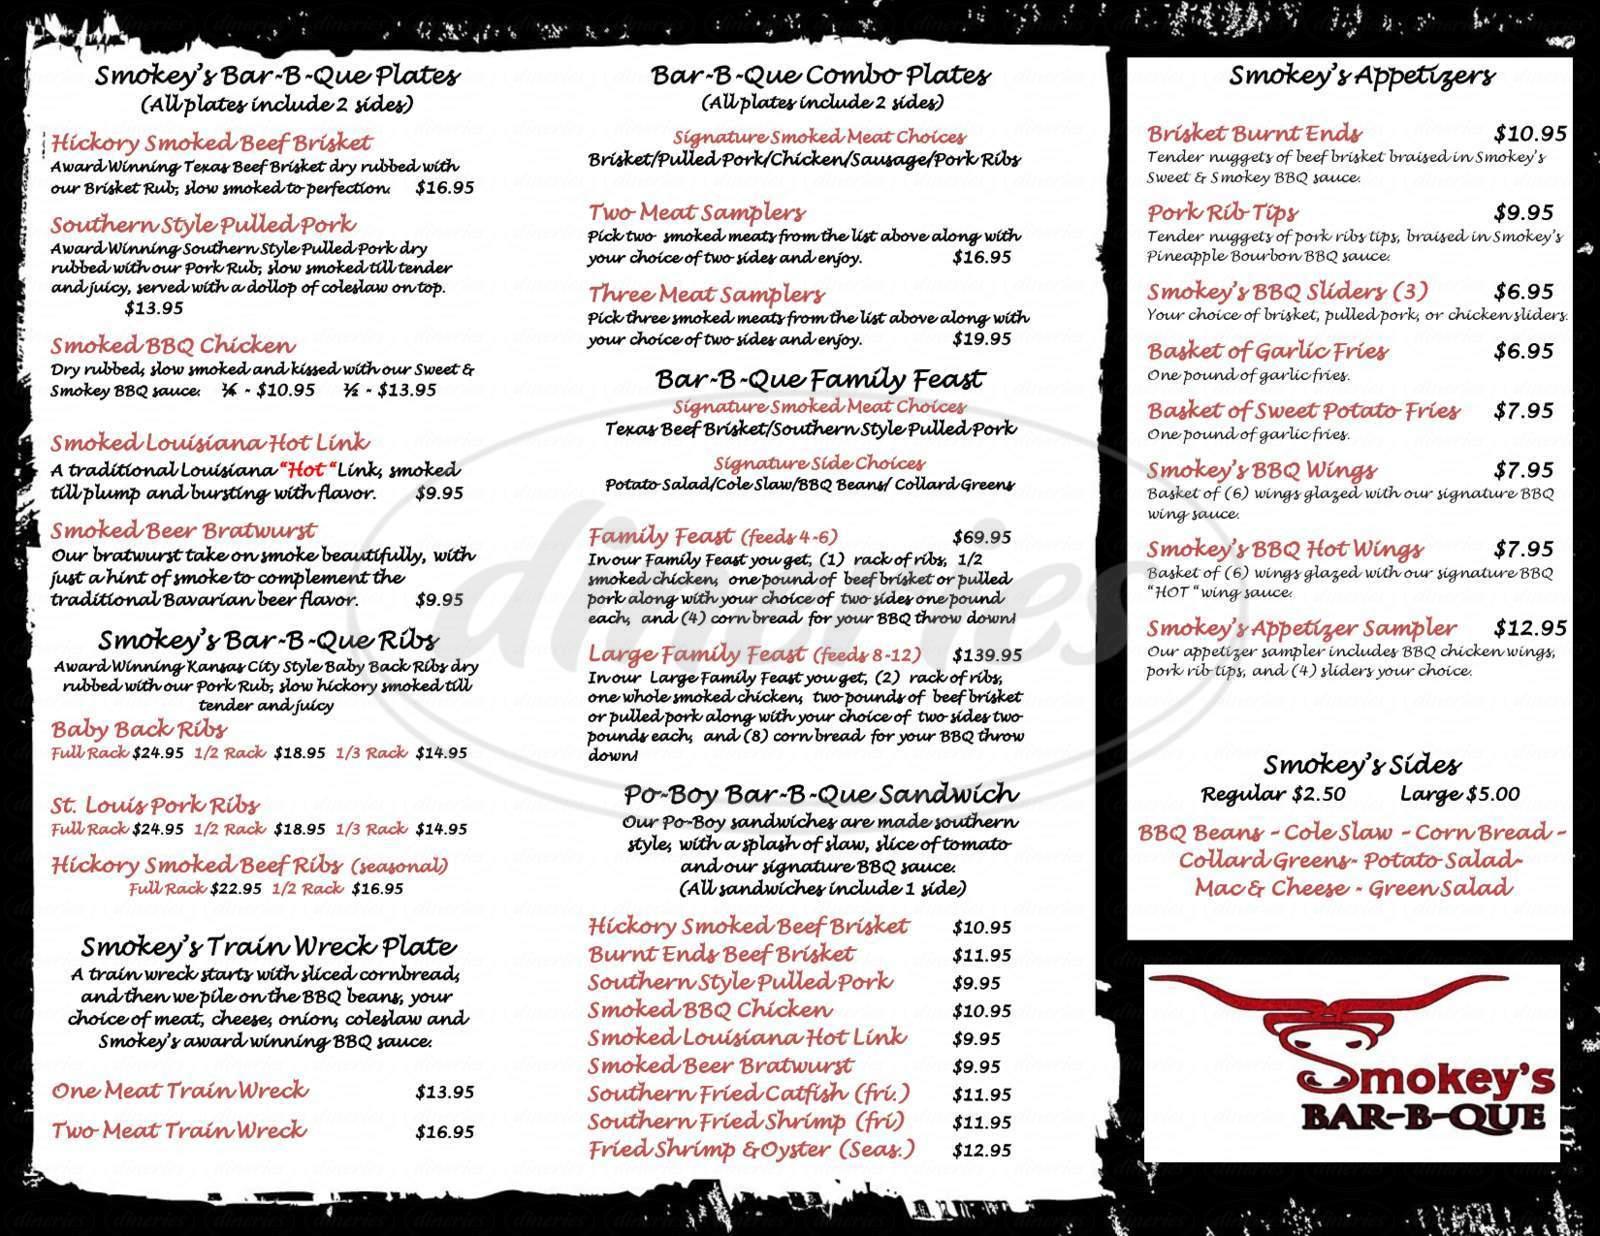 menu for Smokey's BBQ